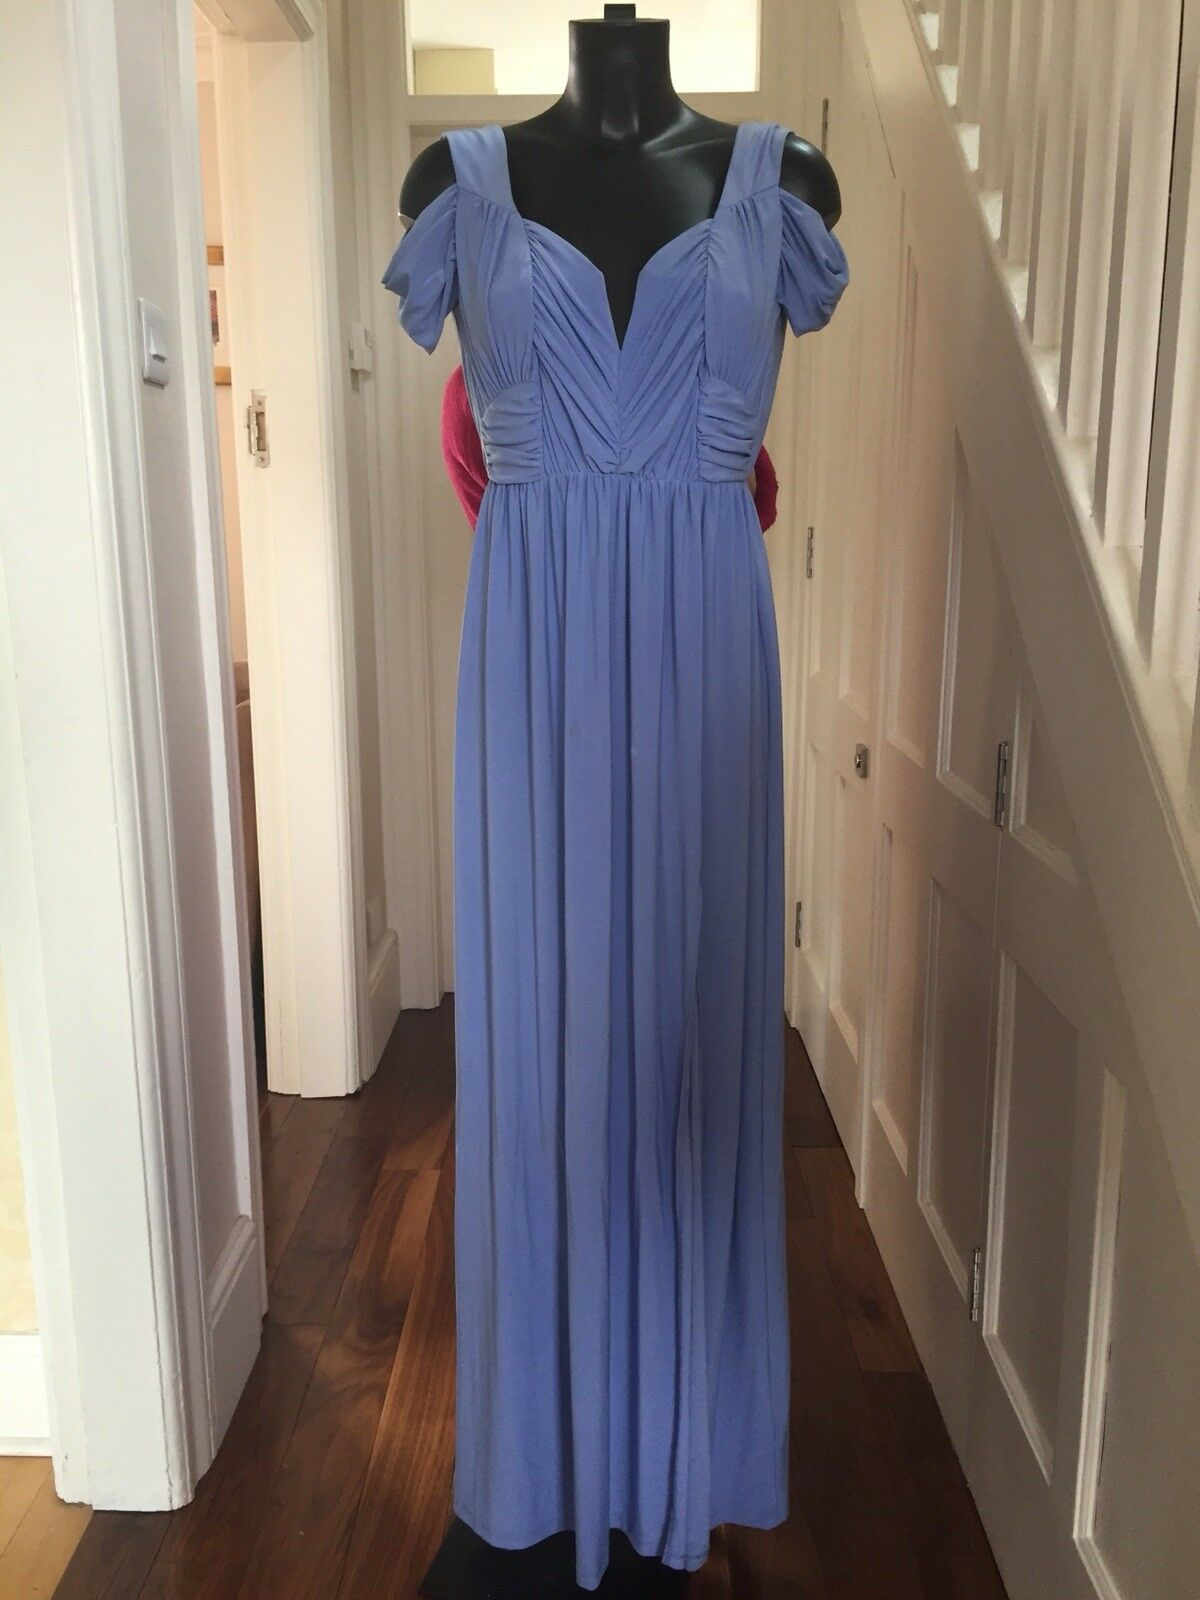 ASOS bluee Cornflower Gown Formal Bridesmaid Wedding Maxi Dress. Worn Once. Sz 10